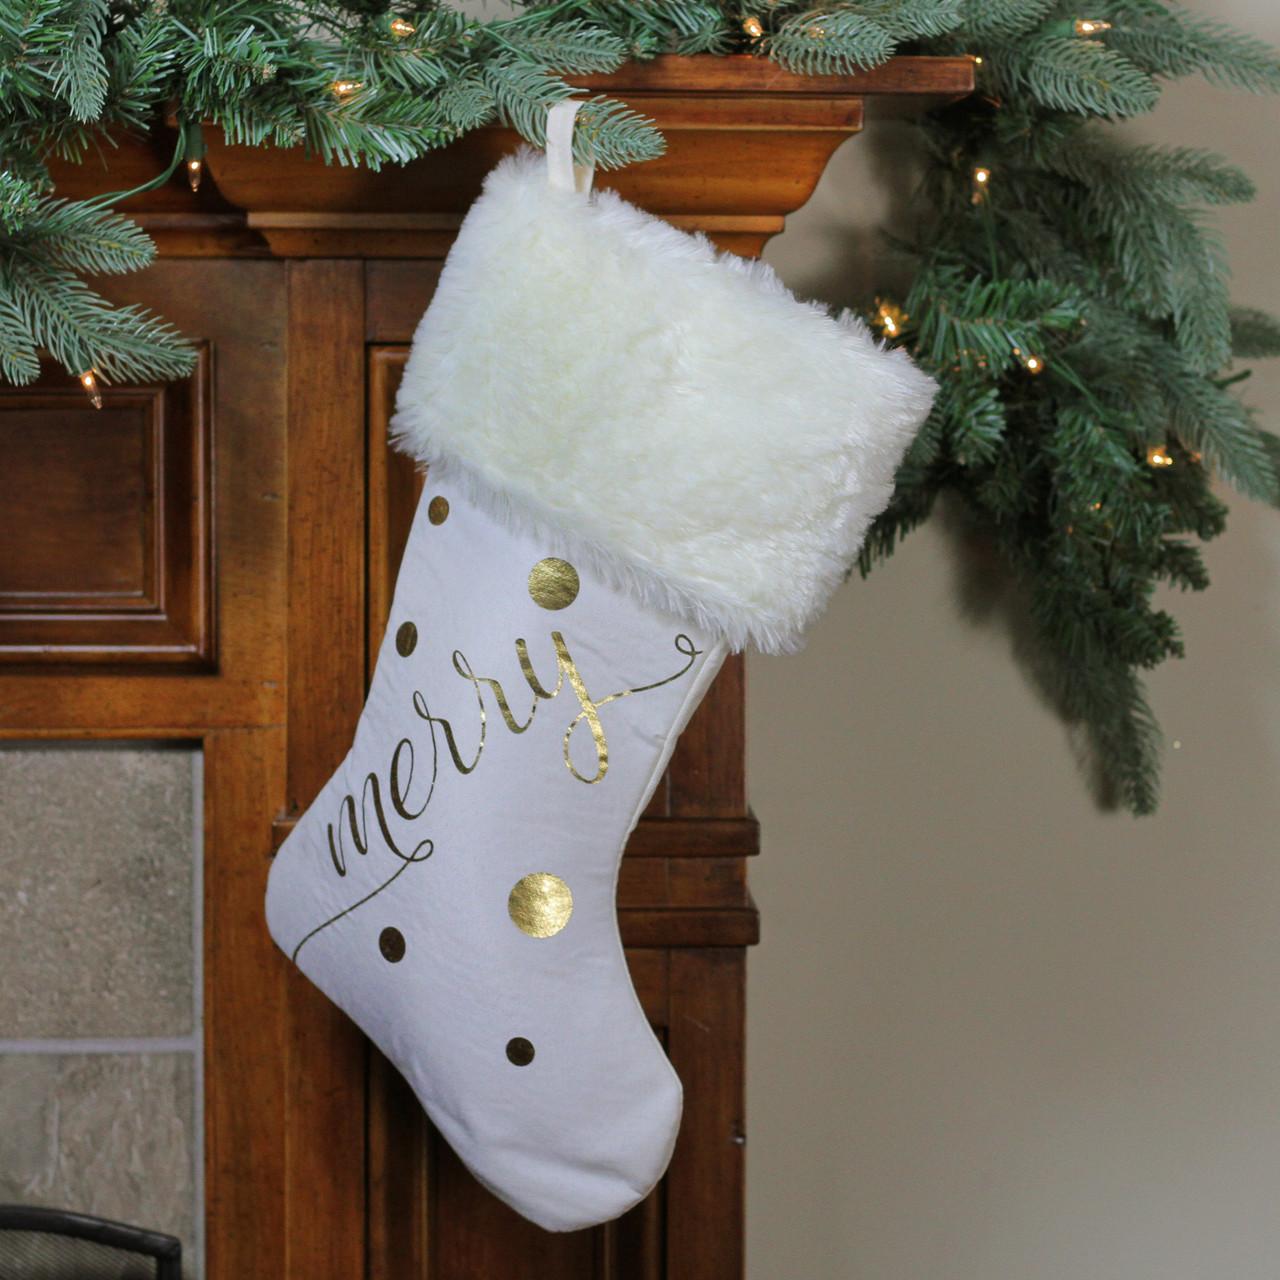 19 ivory white gold foil merry christmas stocking with white faux fur cuff 32635517 - Gold Christmas Stocking